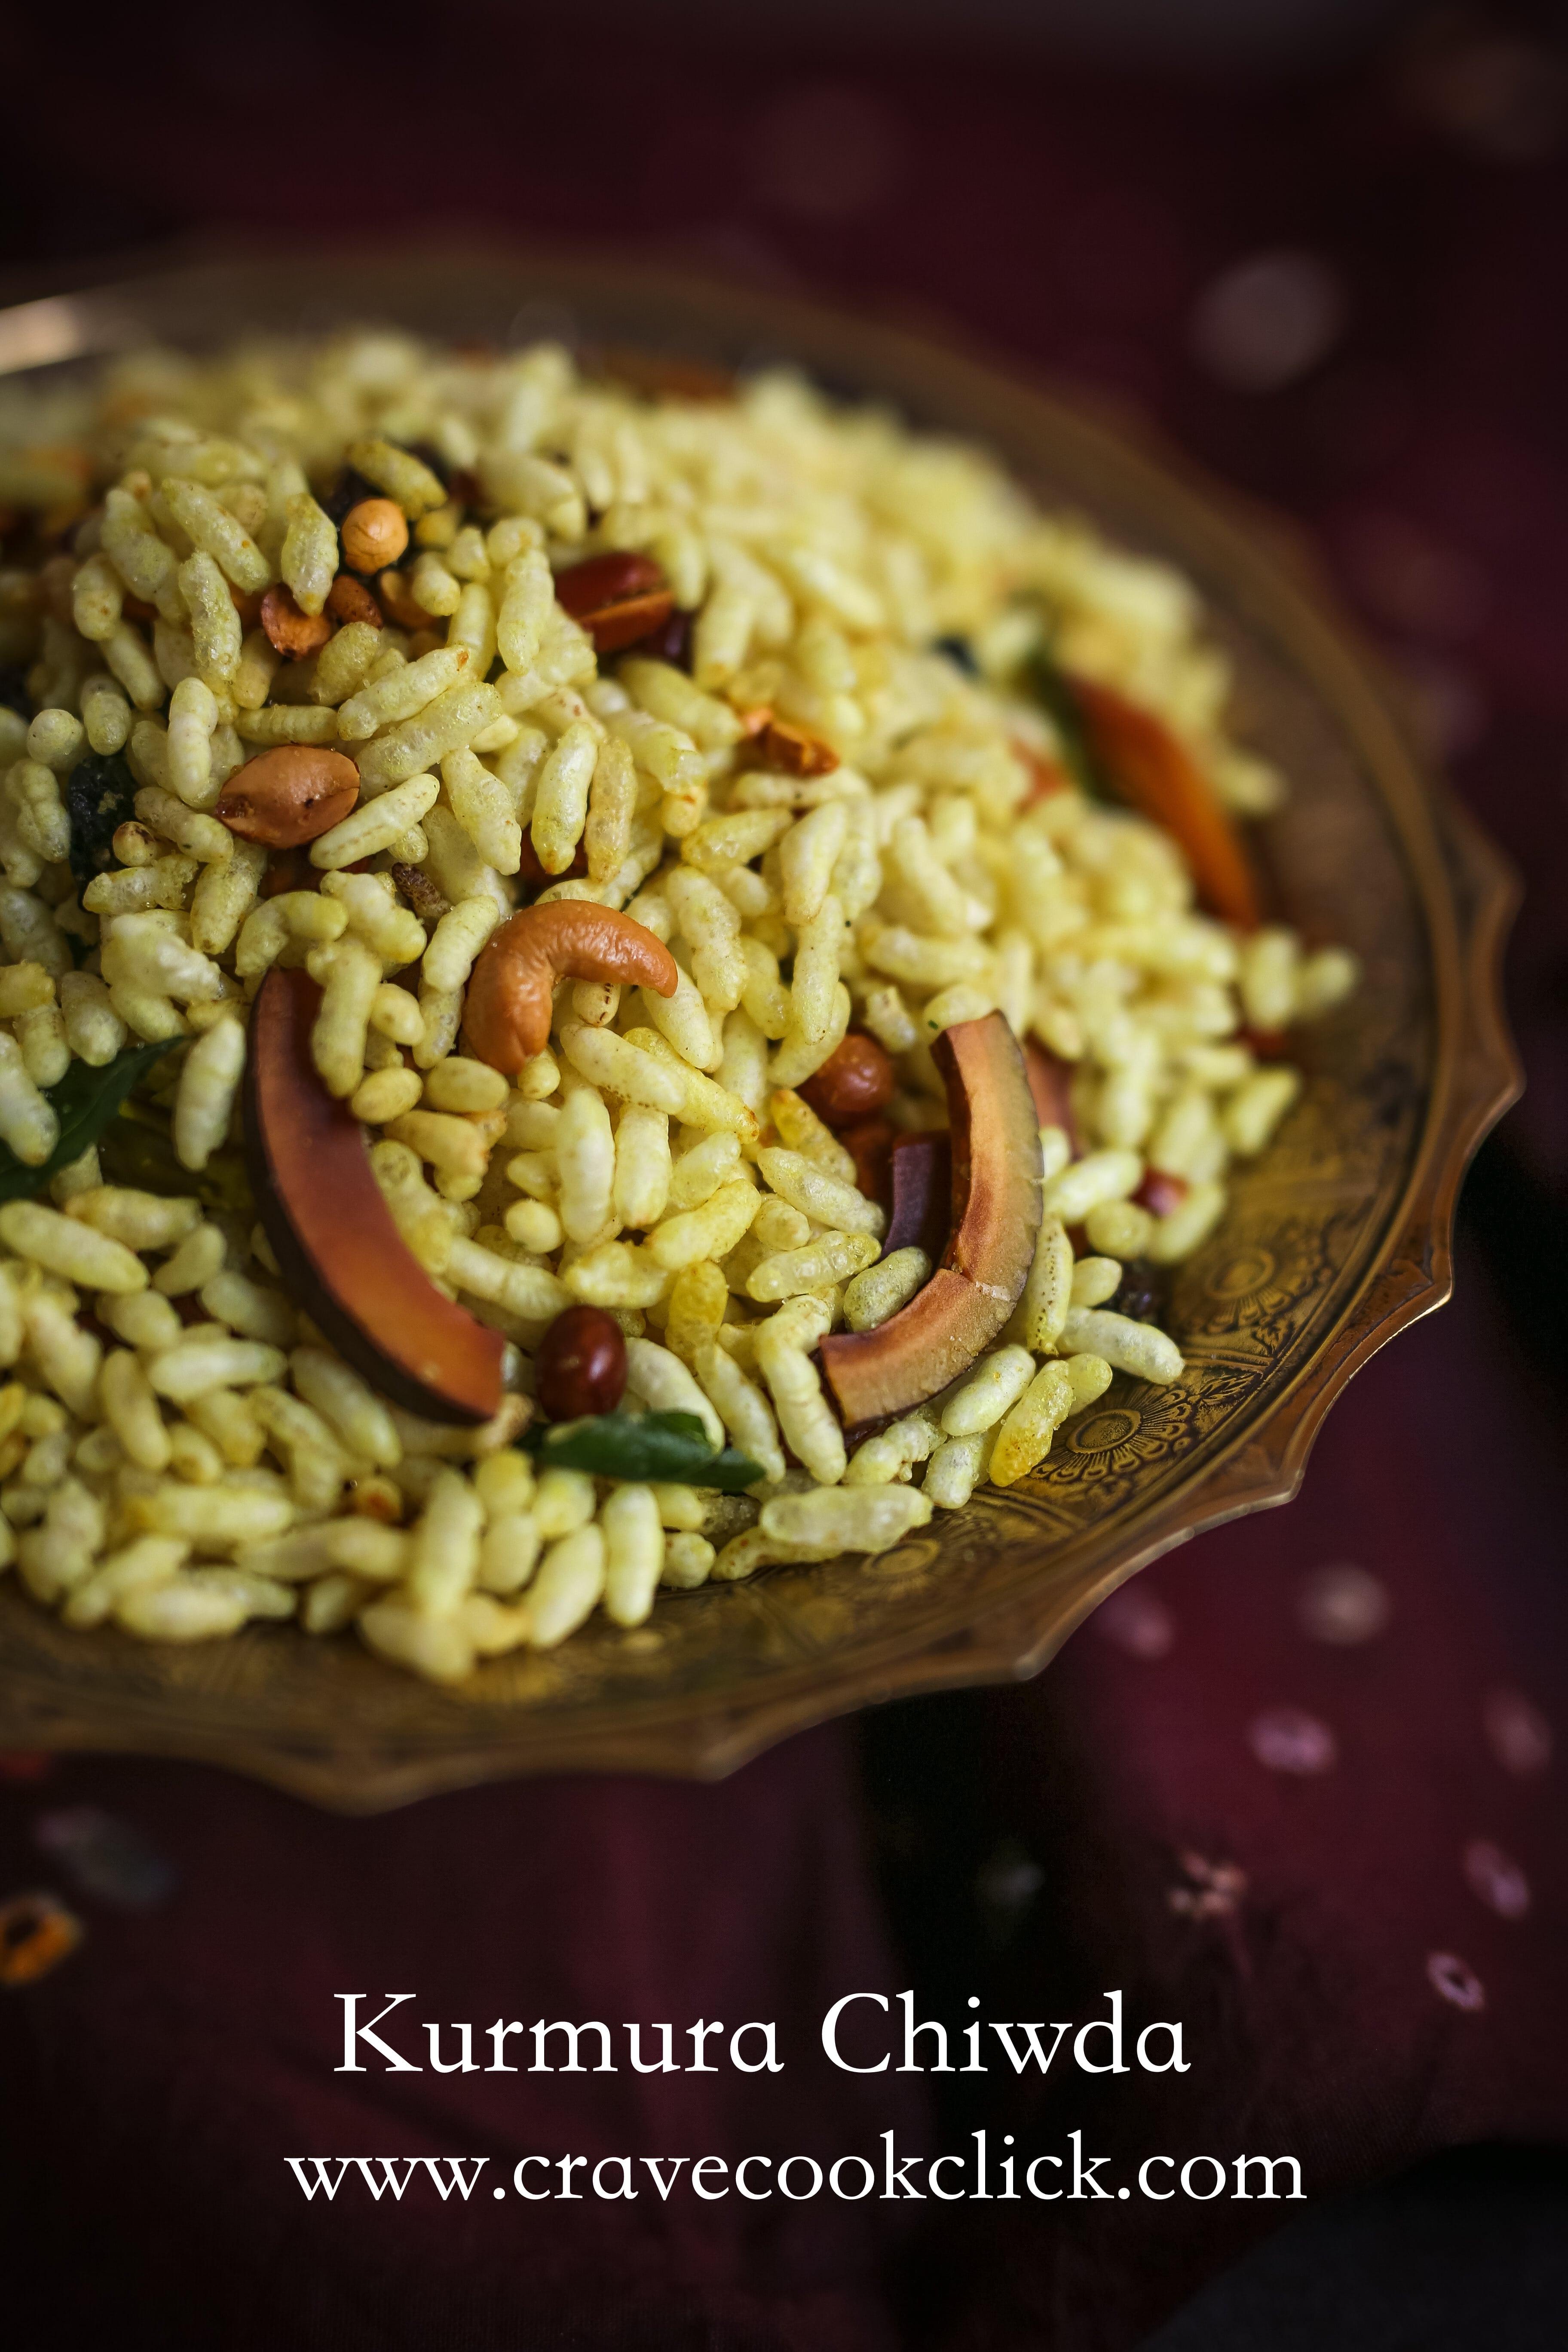 Kurmura Chiwda Recipe- Diwali Delicacy